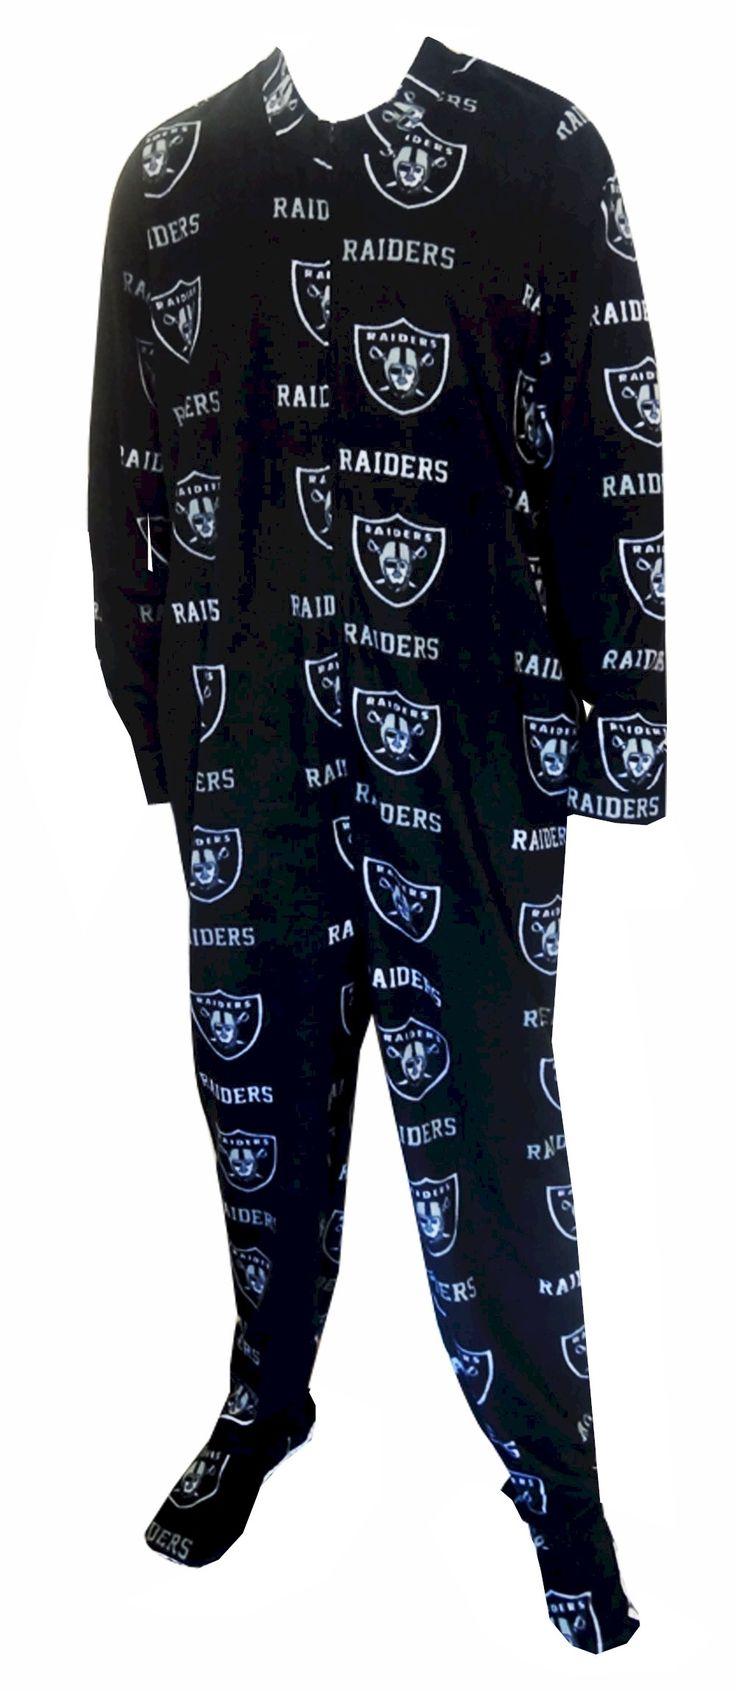 Oakland Raiders Guys Onesie Footie Black Pajama Show your team spirit! This cozy microfleece footie pajama for men features the...